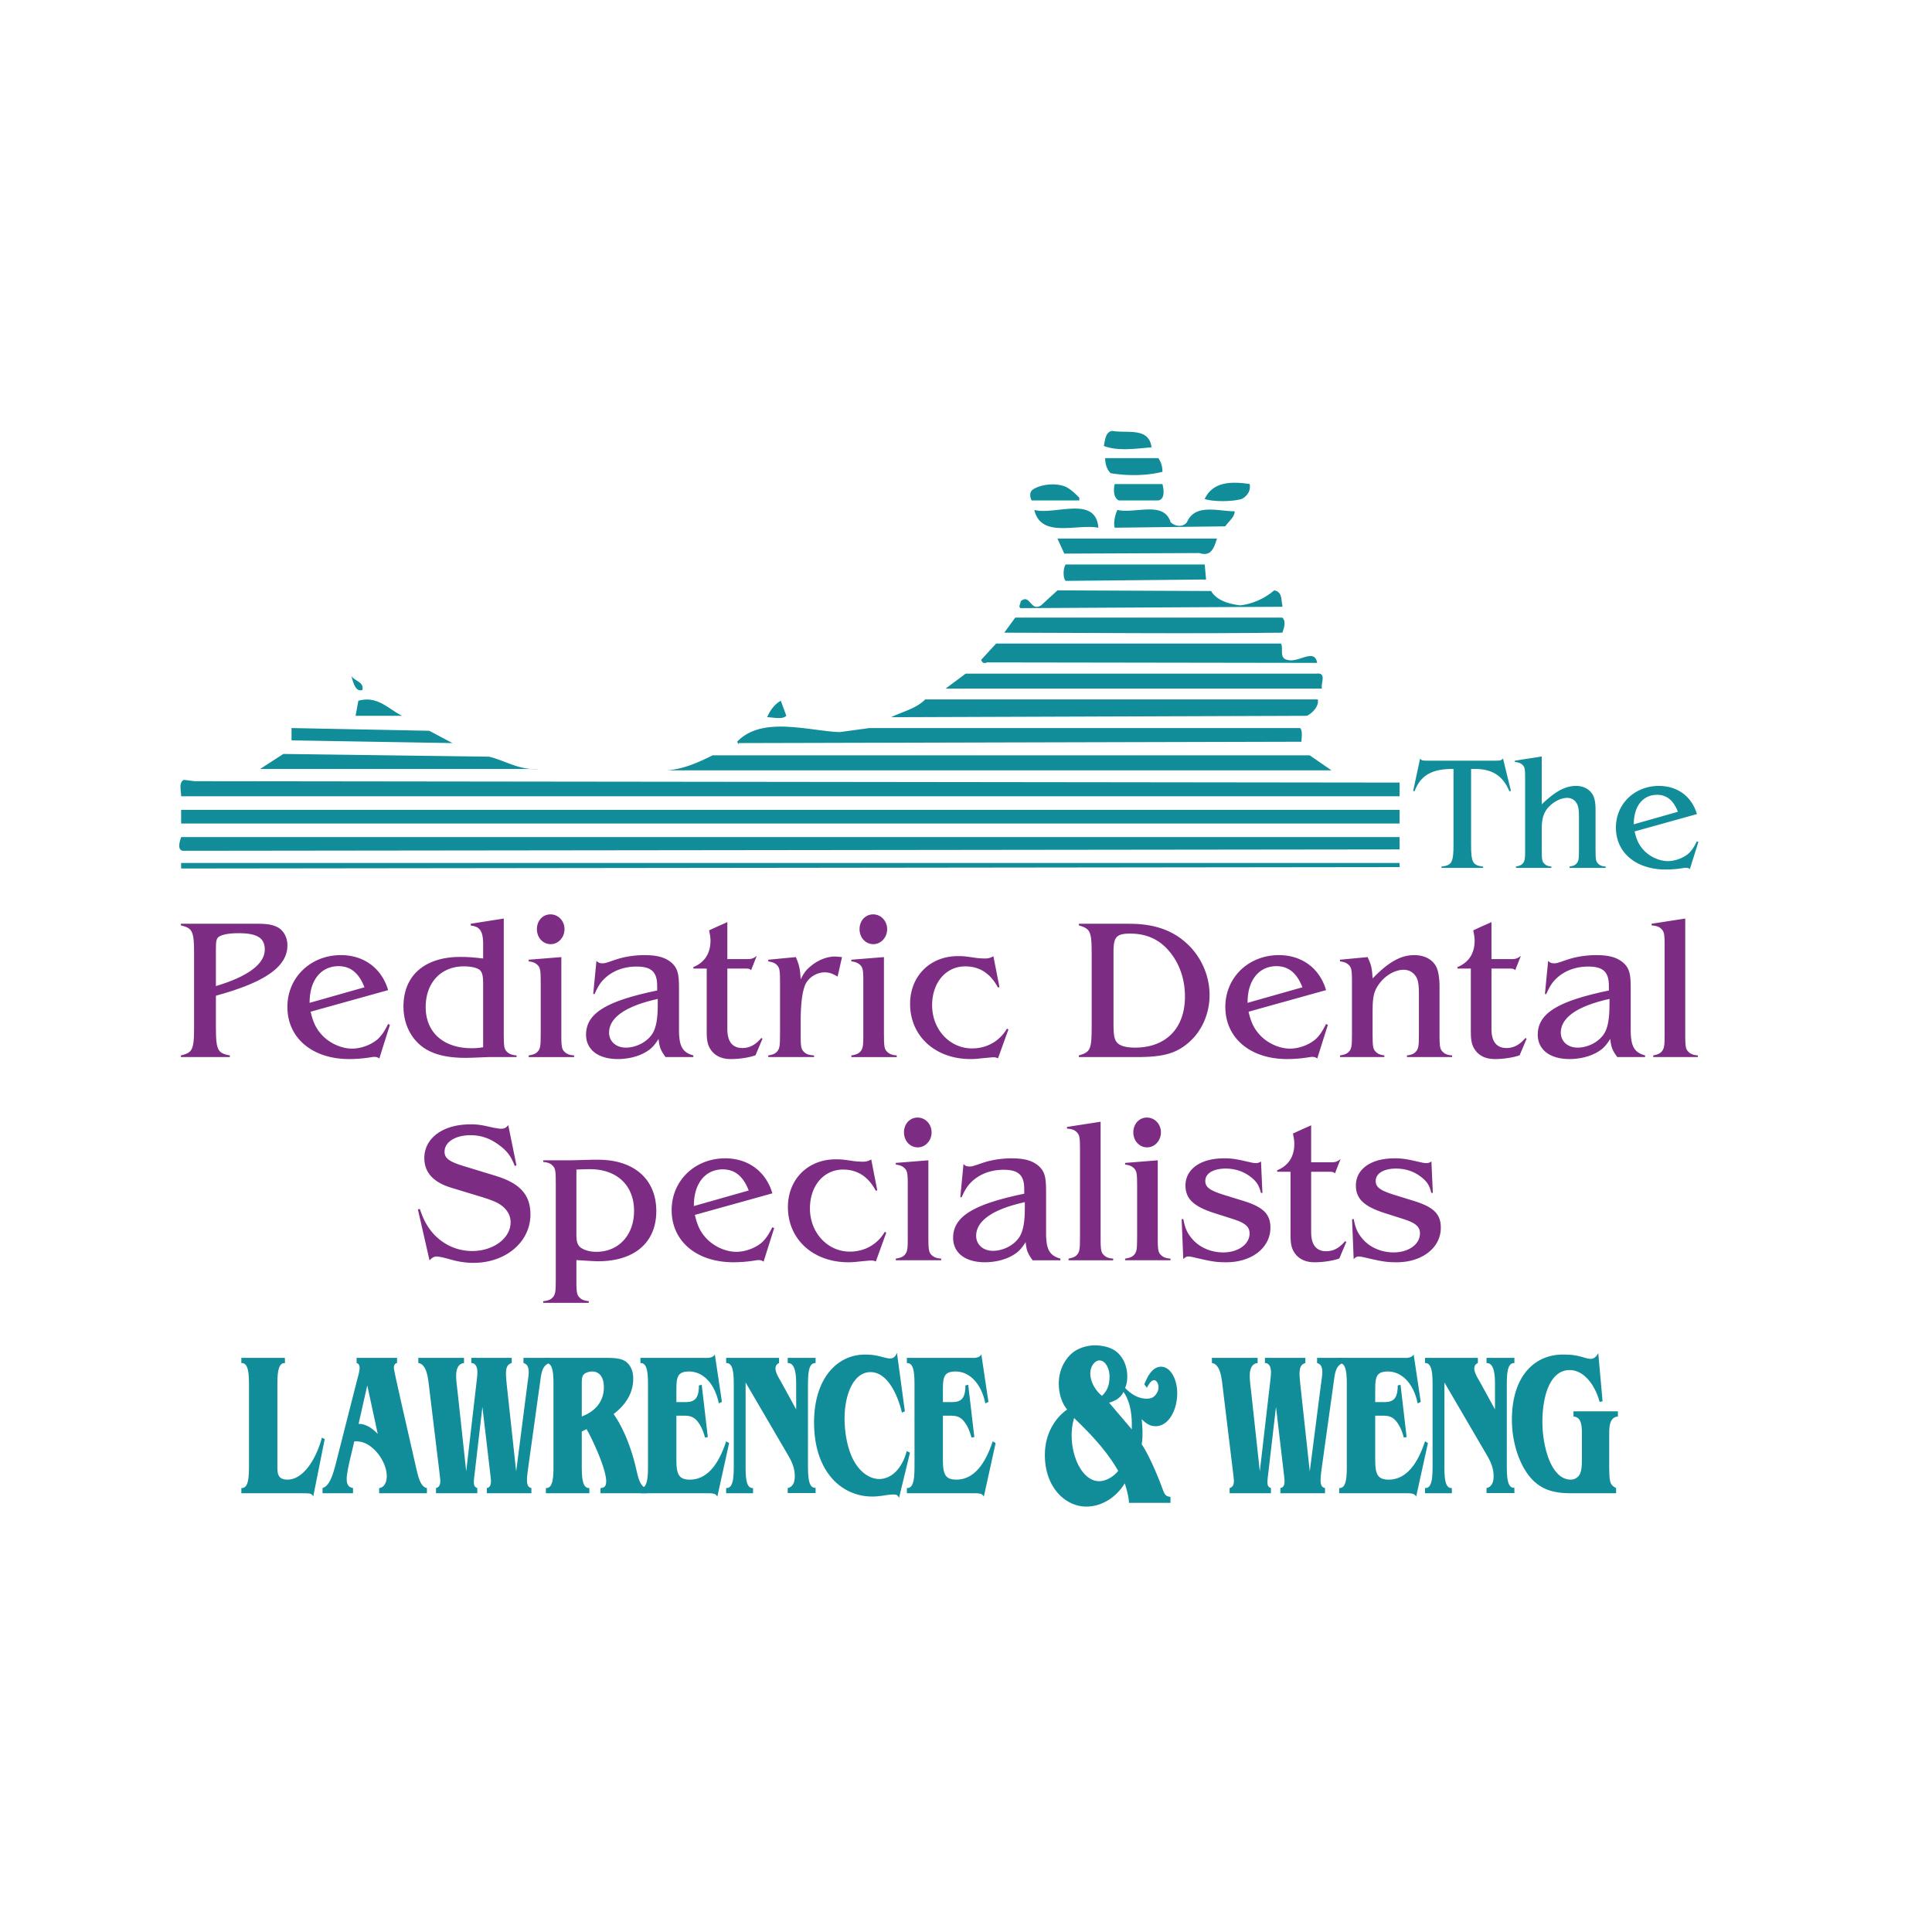 The Pediatric Dental Specialists